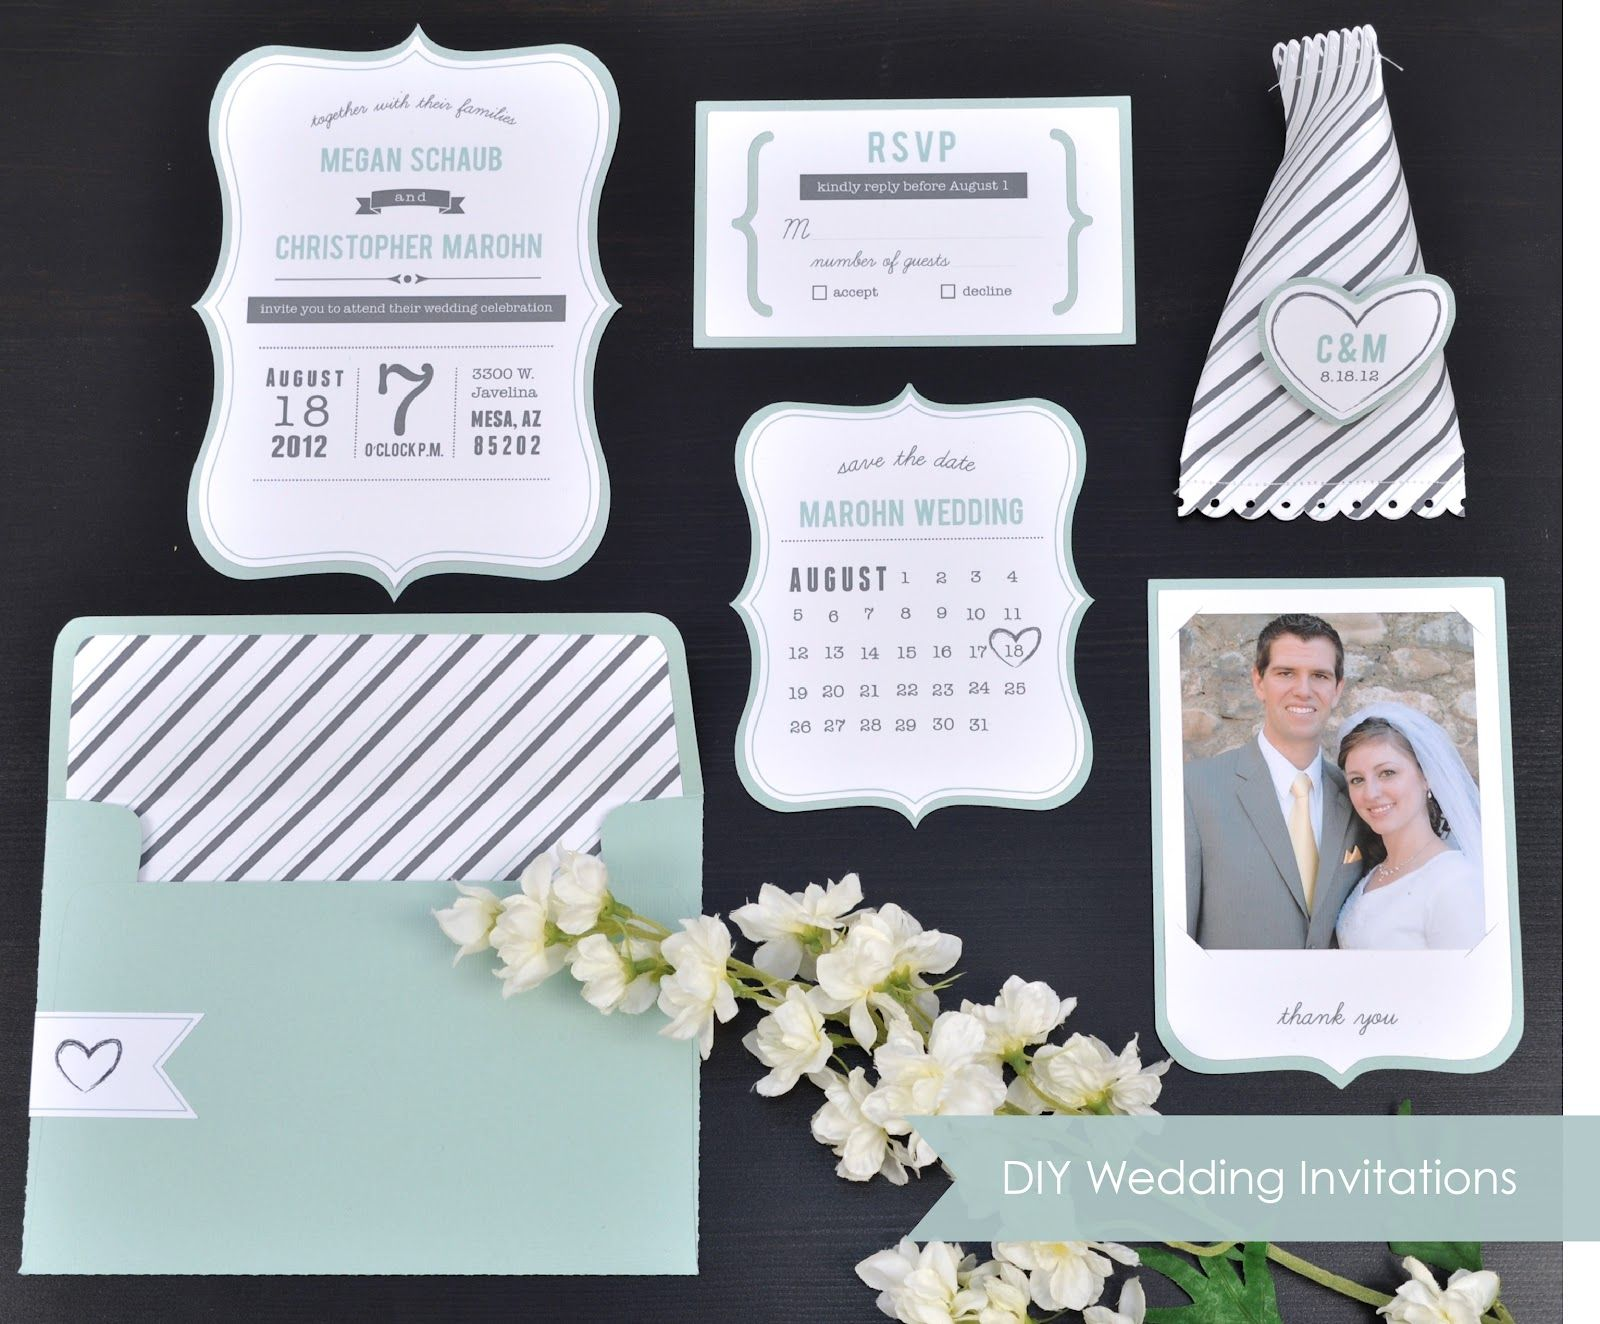 Diy wedding invitations invitations pinterest diy wedding